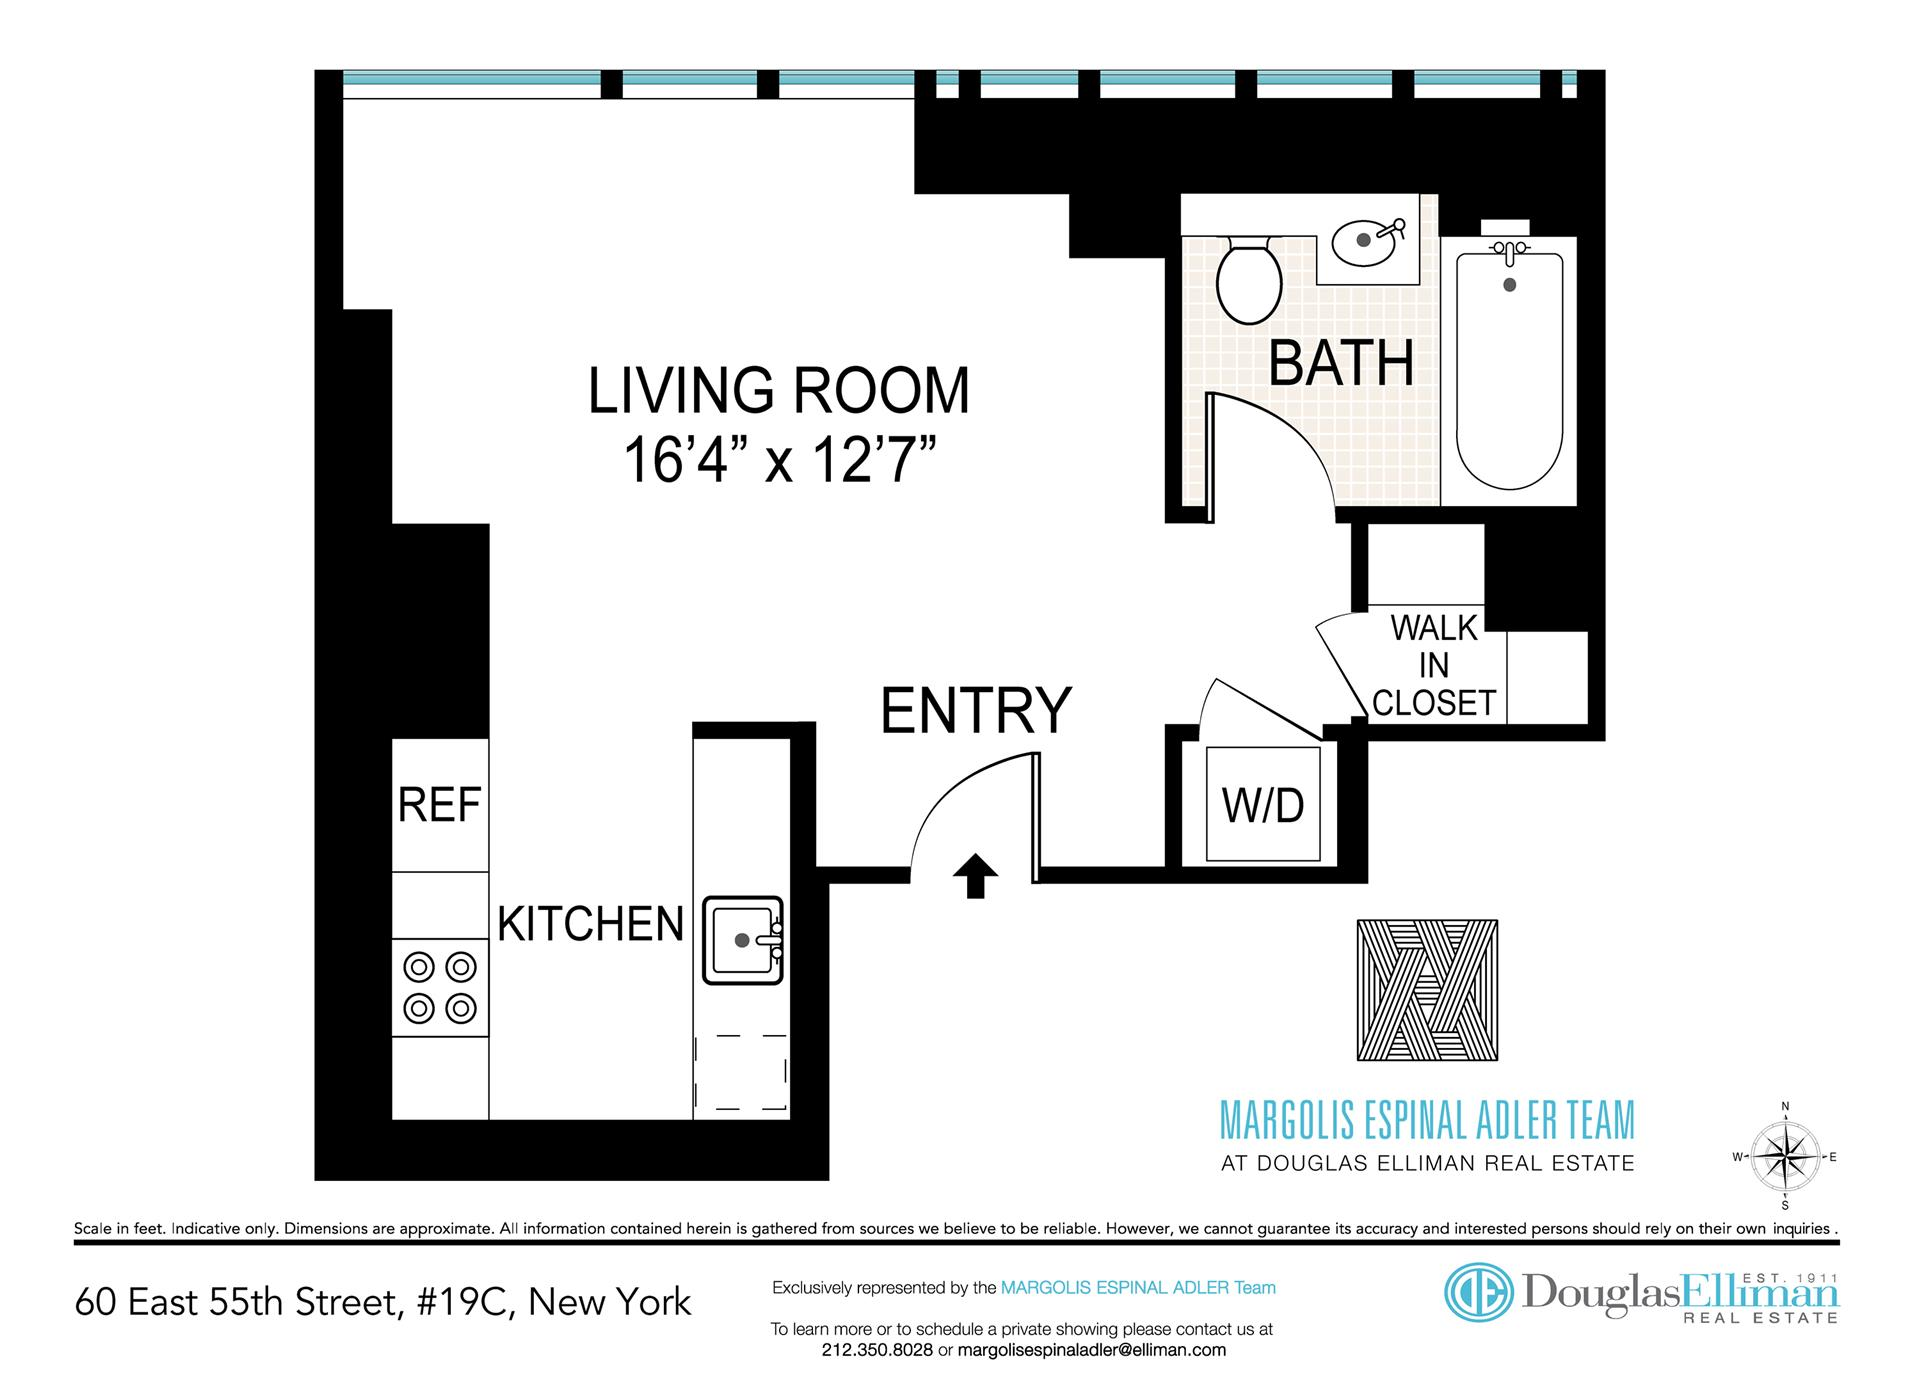 Floor plan of 60 East 55th St, 19C - Midtown, New York